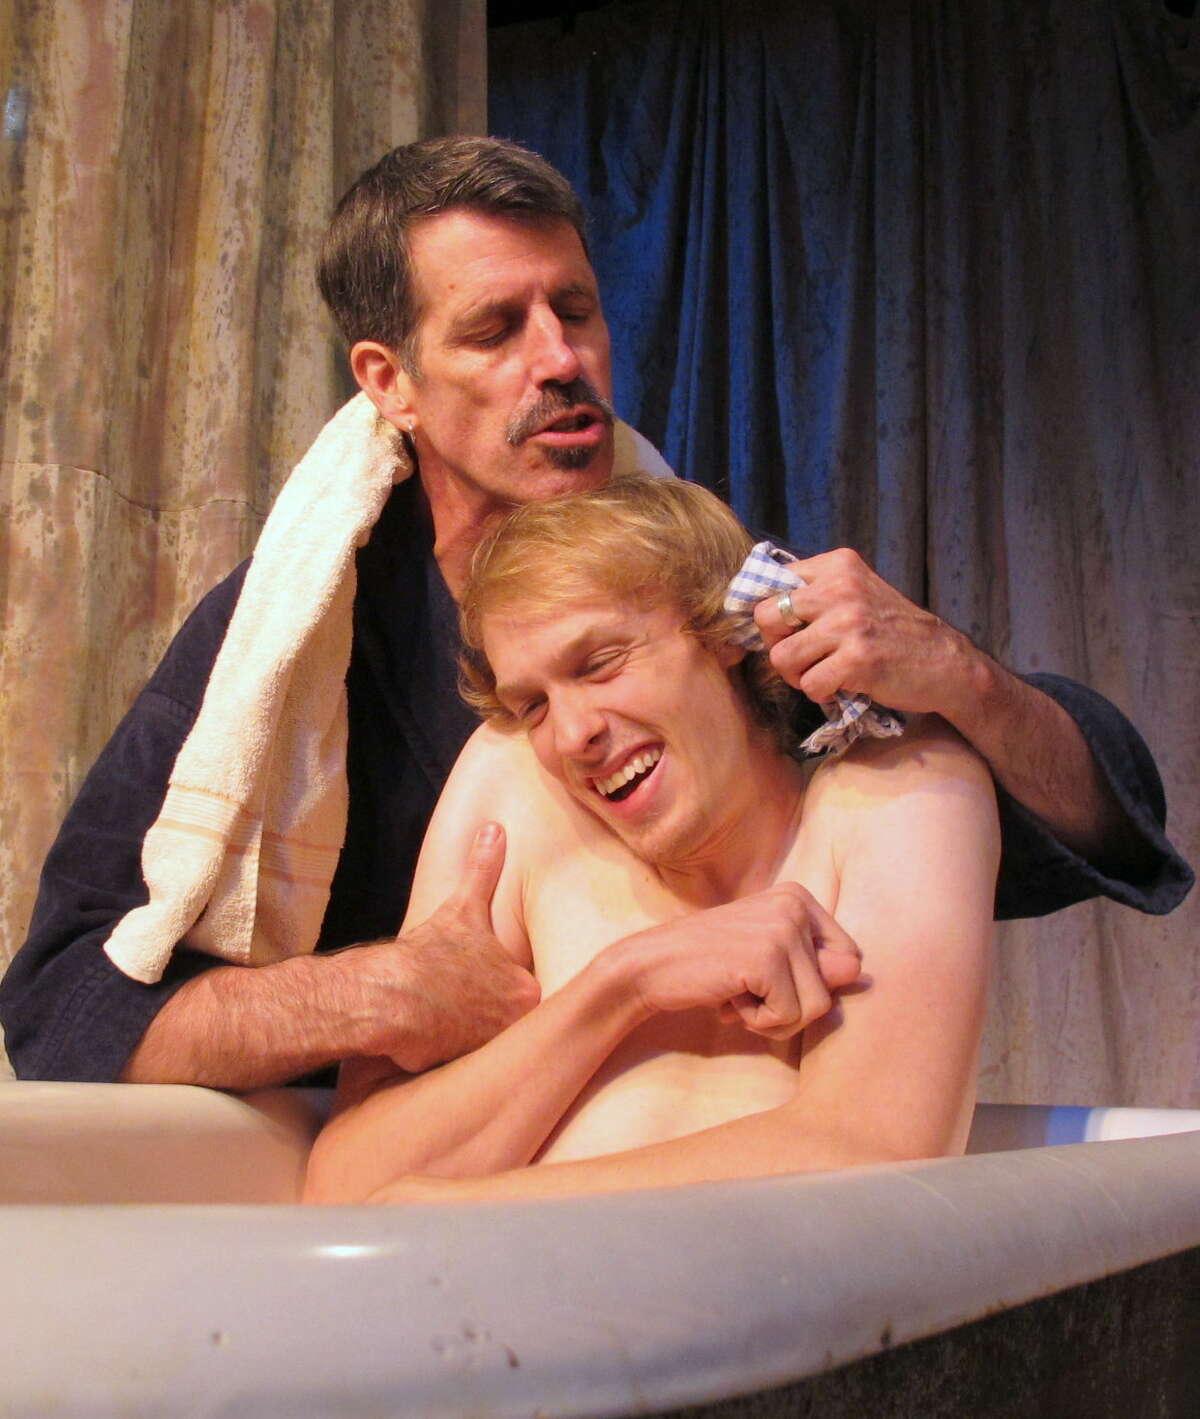 Kill Me Now by Brad Fraser Steven Patterson as Jake, Samuel Hoeksema as Joey Photo: John Sowle